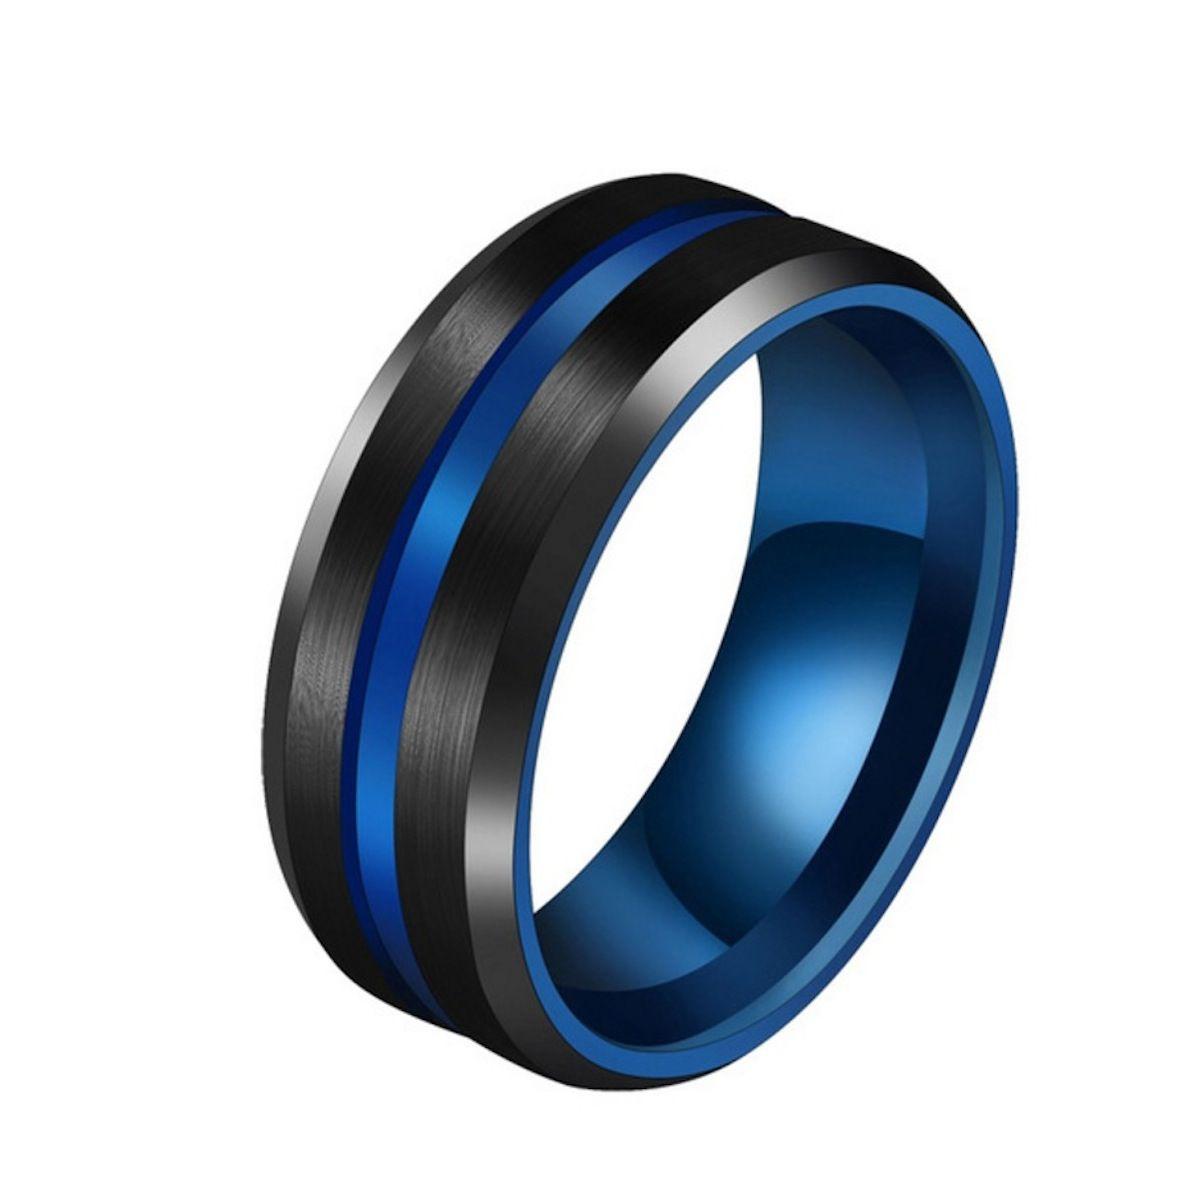 Anel Black Blue Hematita Emagrecimento Magnética Equilíbrio